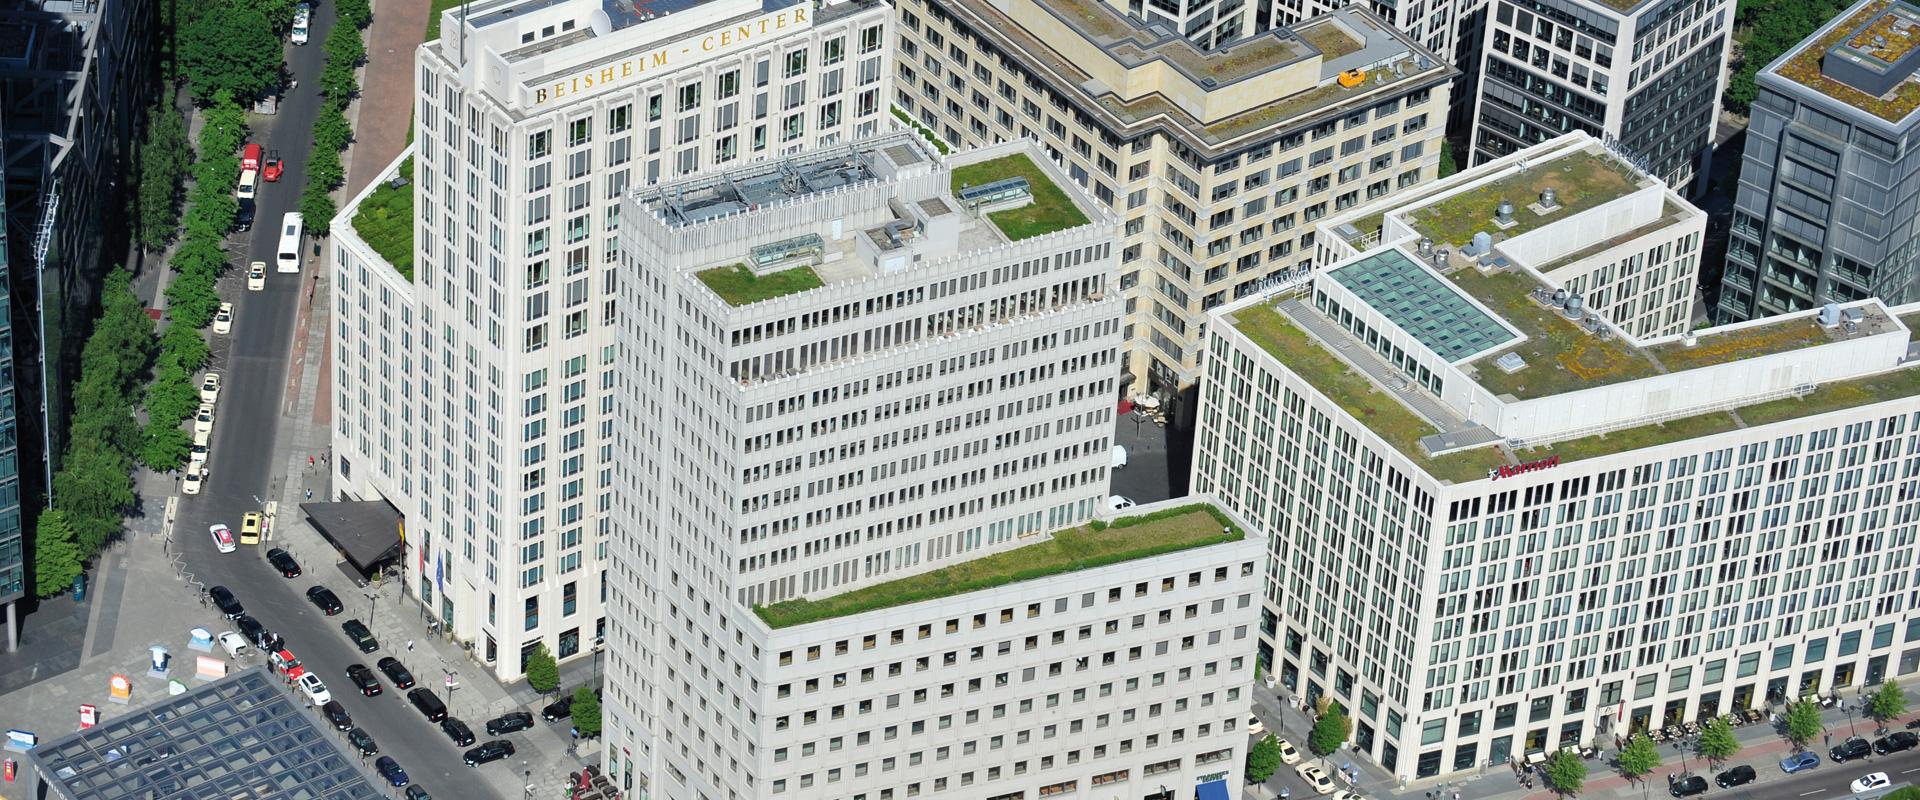 Baufirmen München immobilien in münchen pöttinger immobilien